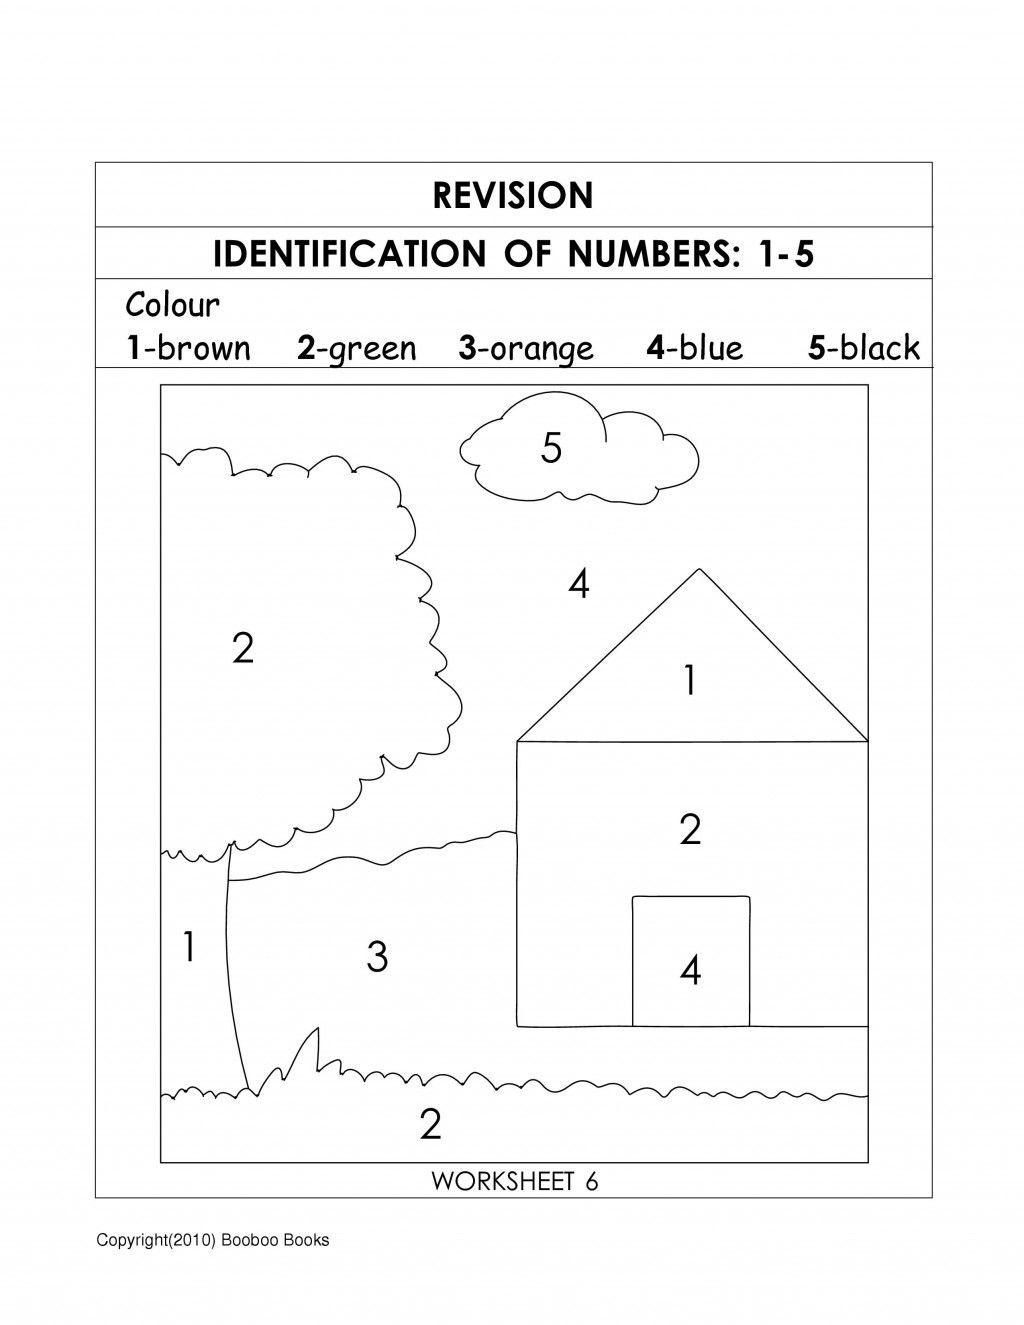 Number Recognition Worksheets Activities Numbers Preschool Number Recognition Worksheets Preschool Worksheets [ 1325 x 1024 Pixel ]